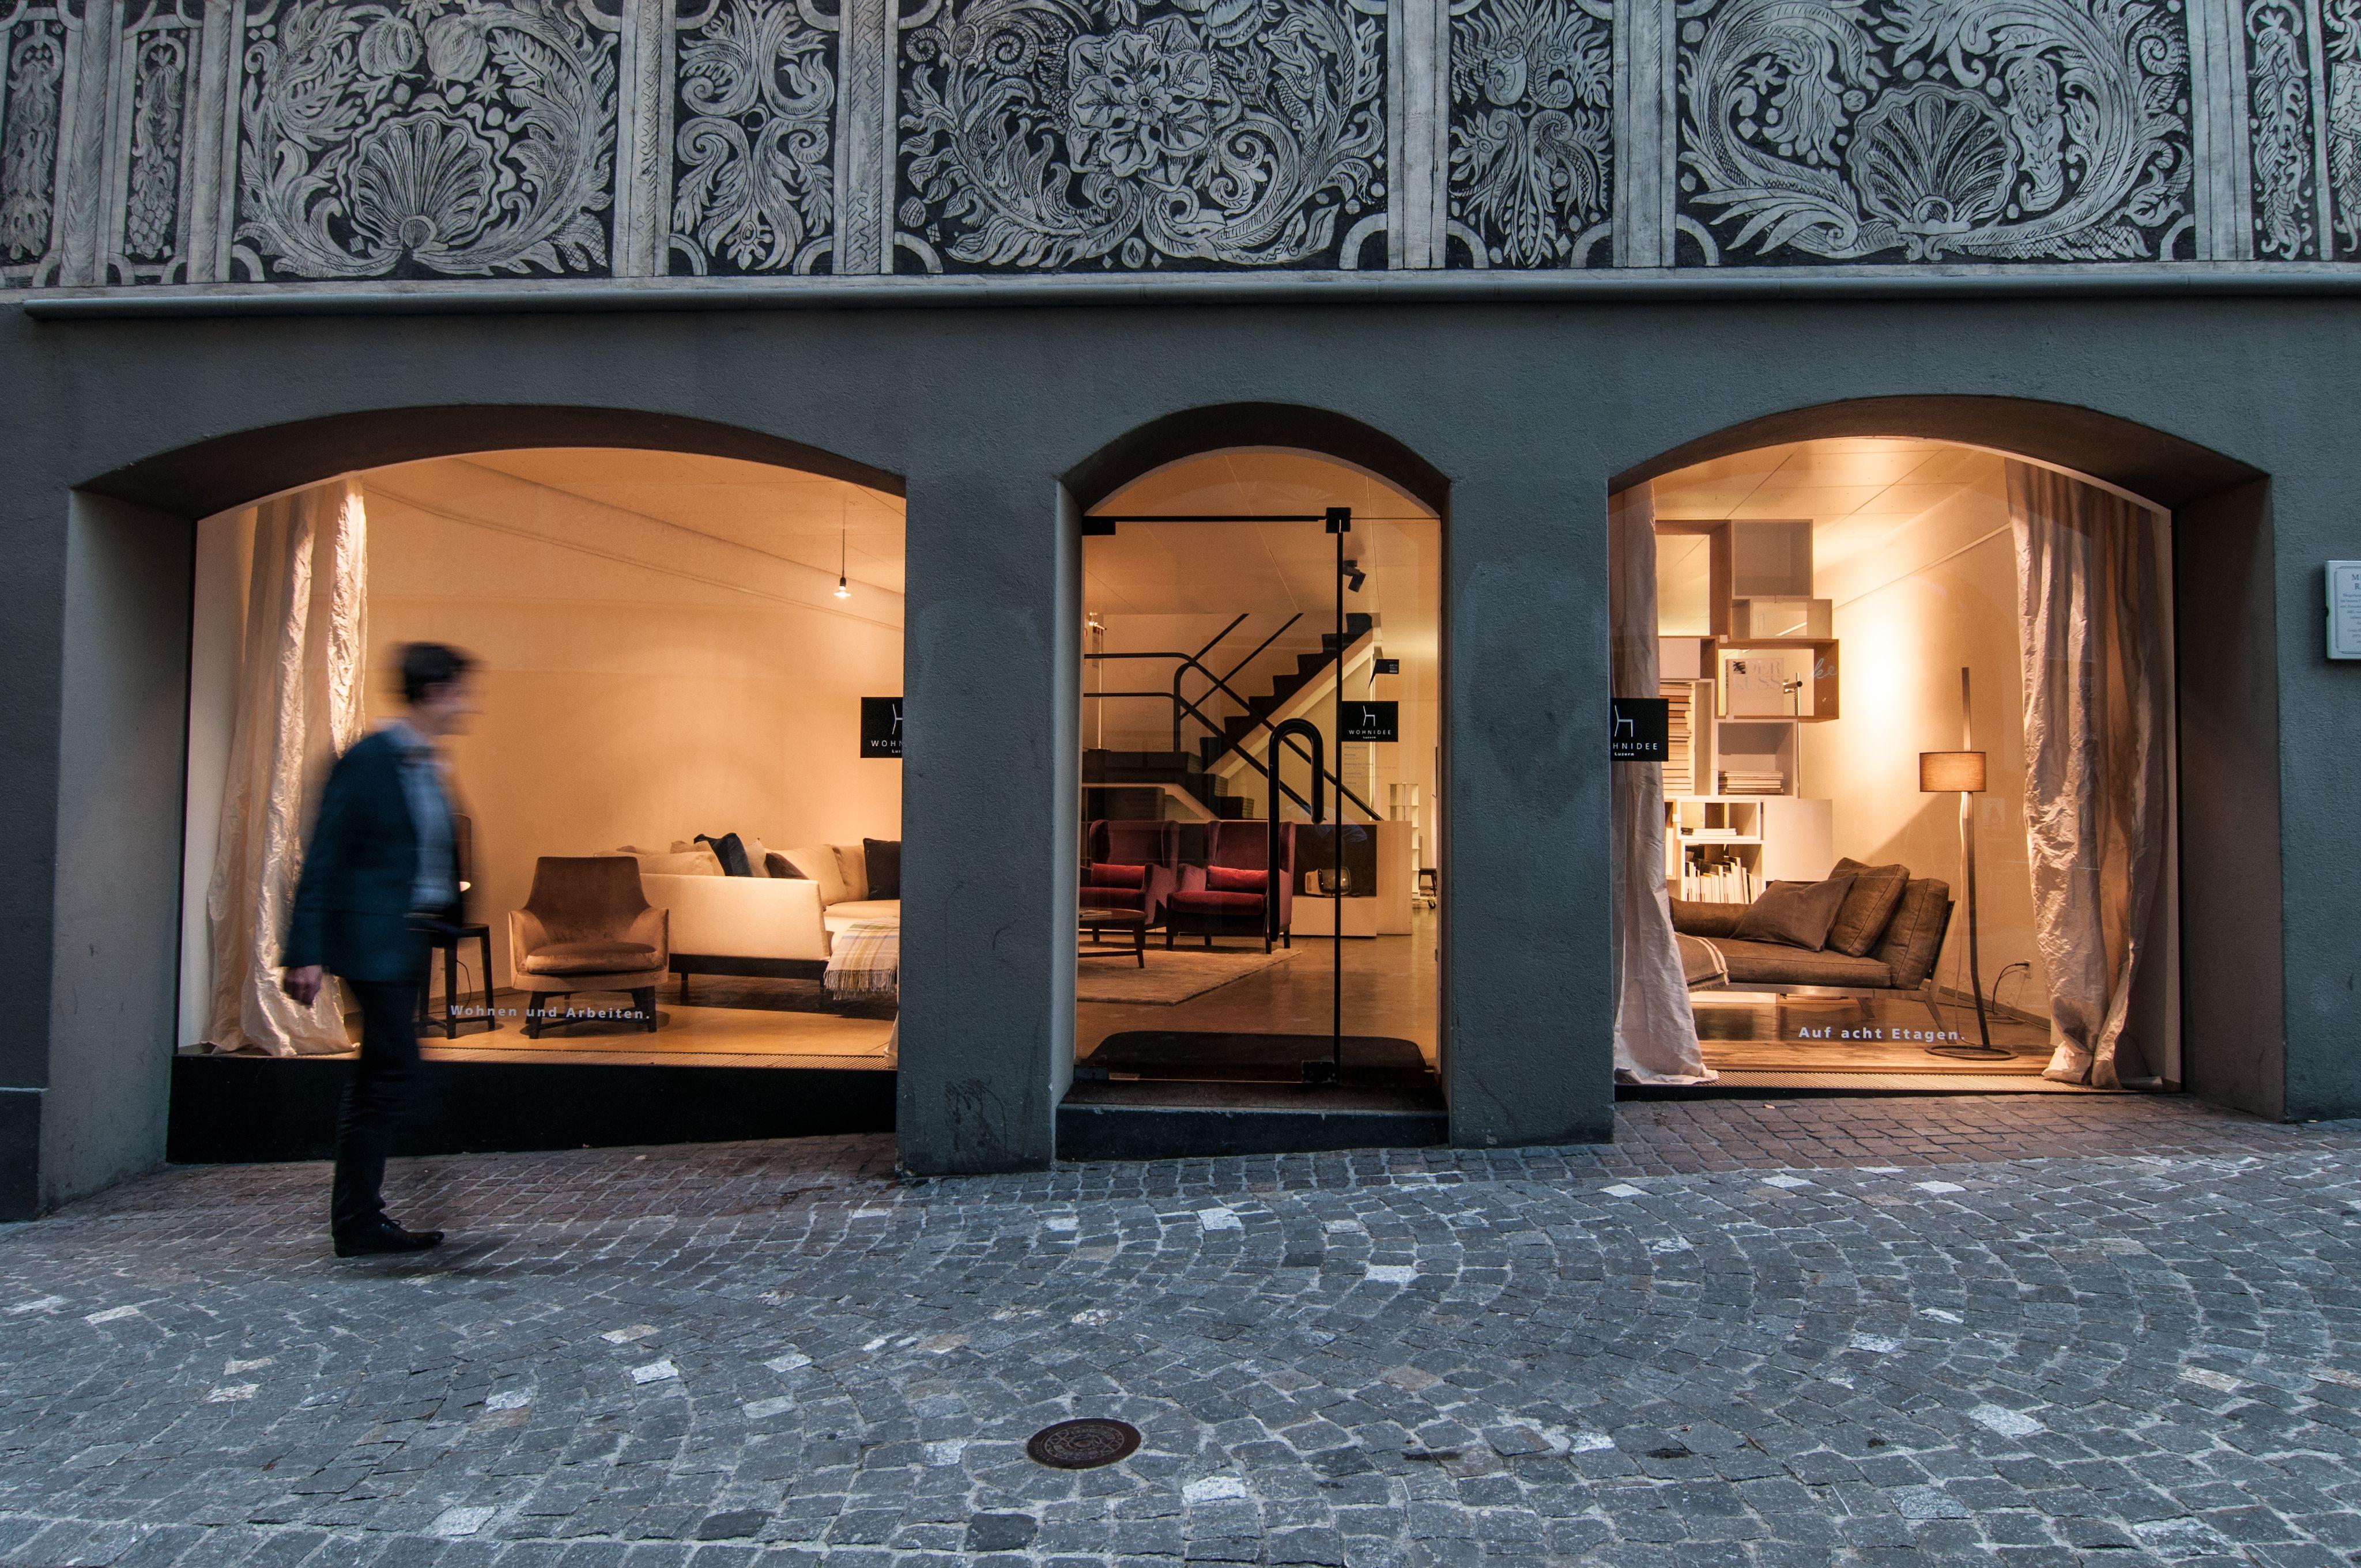 Wohnideen Luzern wohnidee luzern wohnidee luzern ag interiors